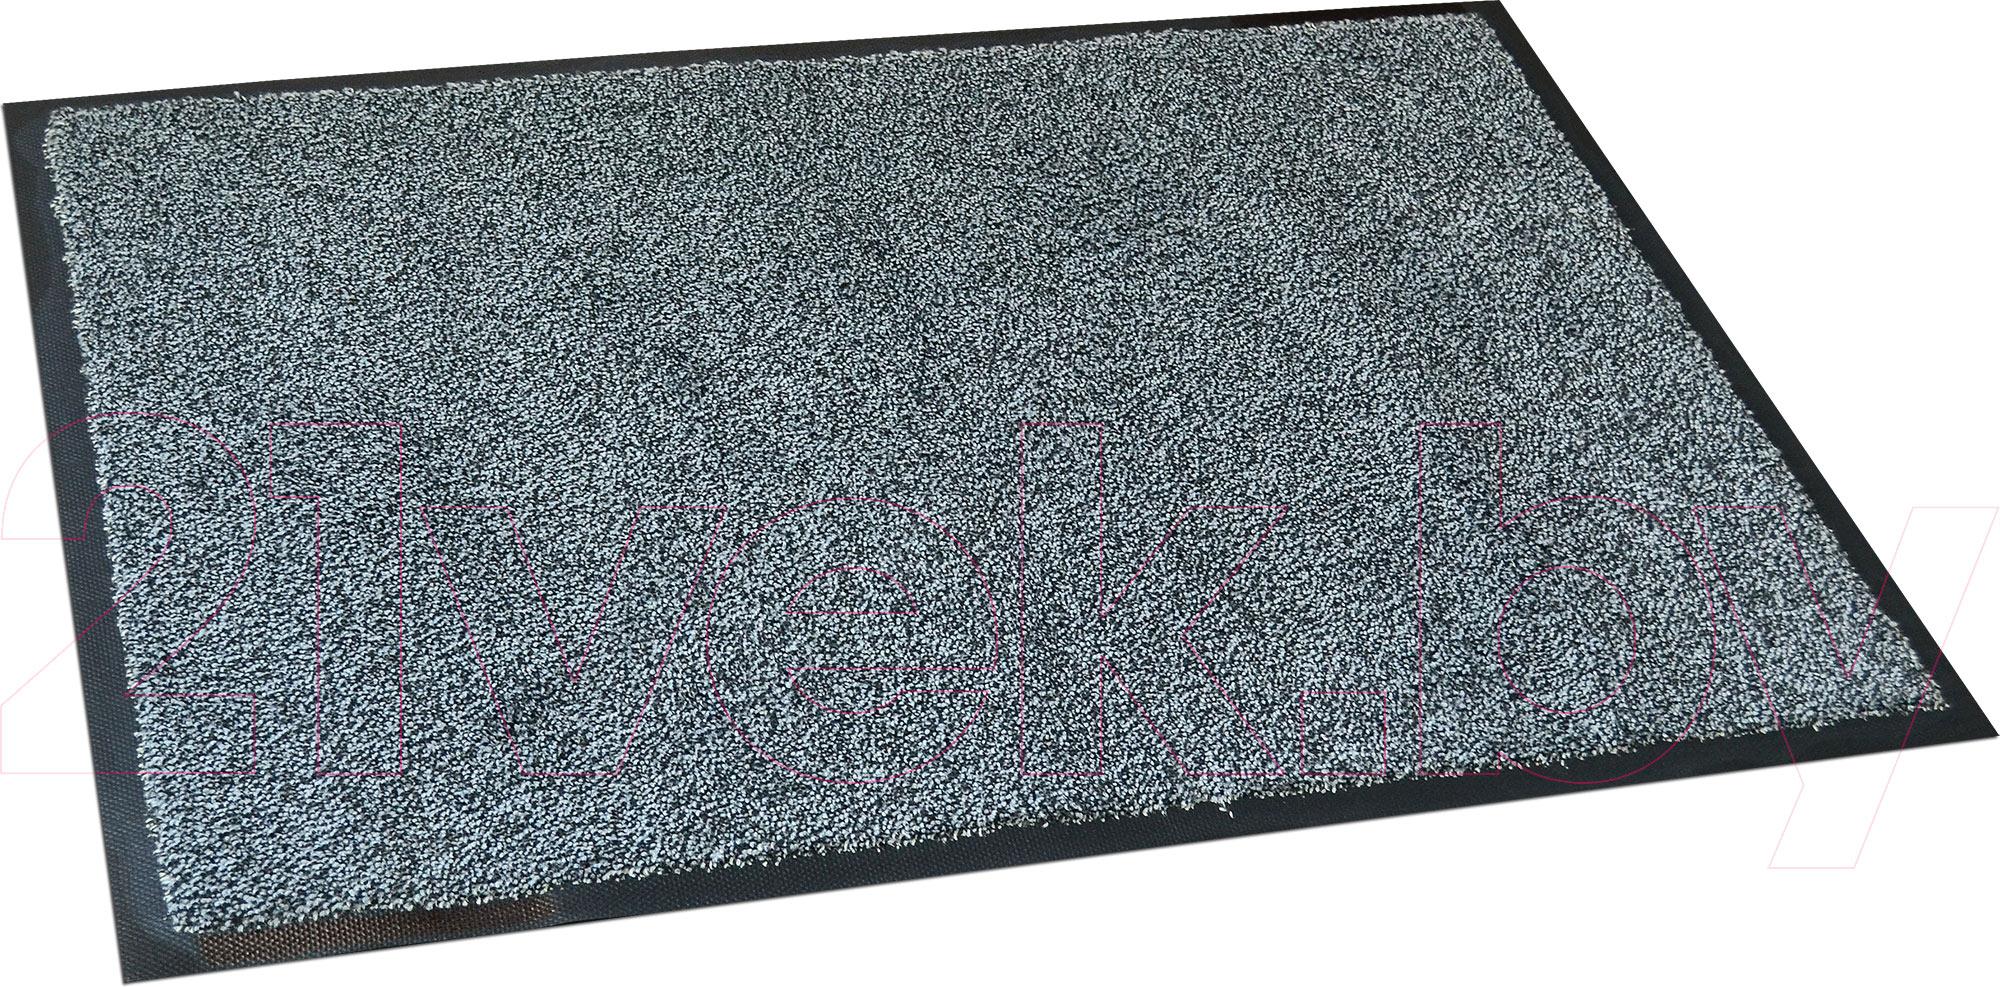 Iron Horse 85x150 (Black Steel) 21vek.by 1040000.000